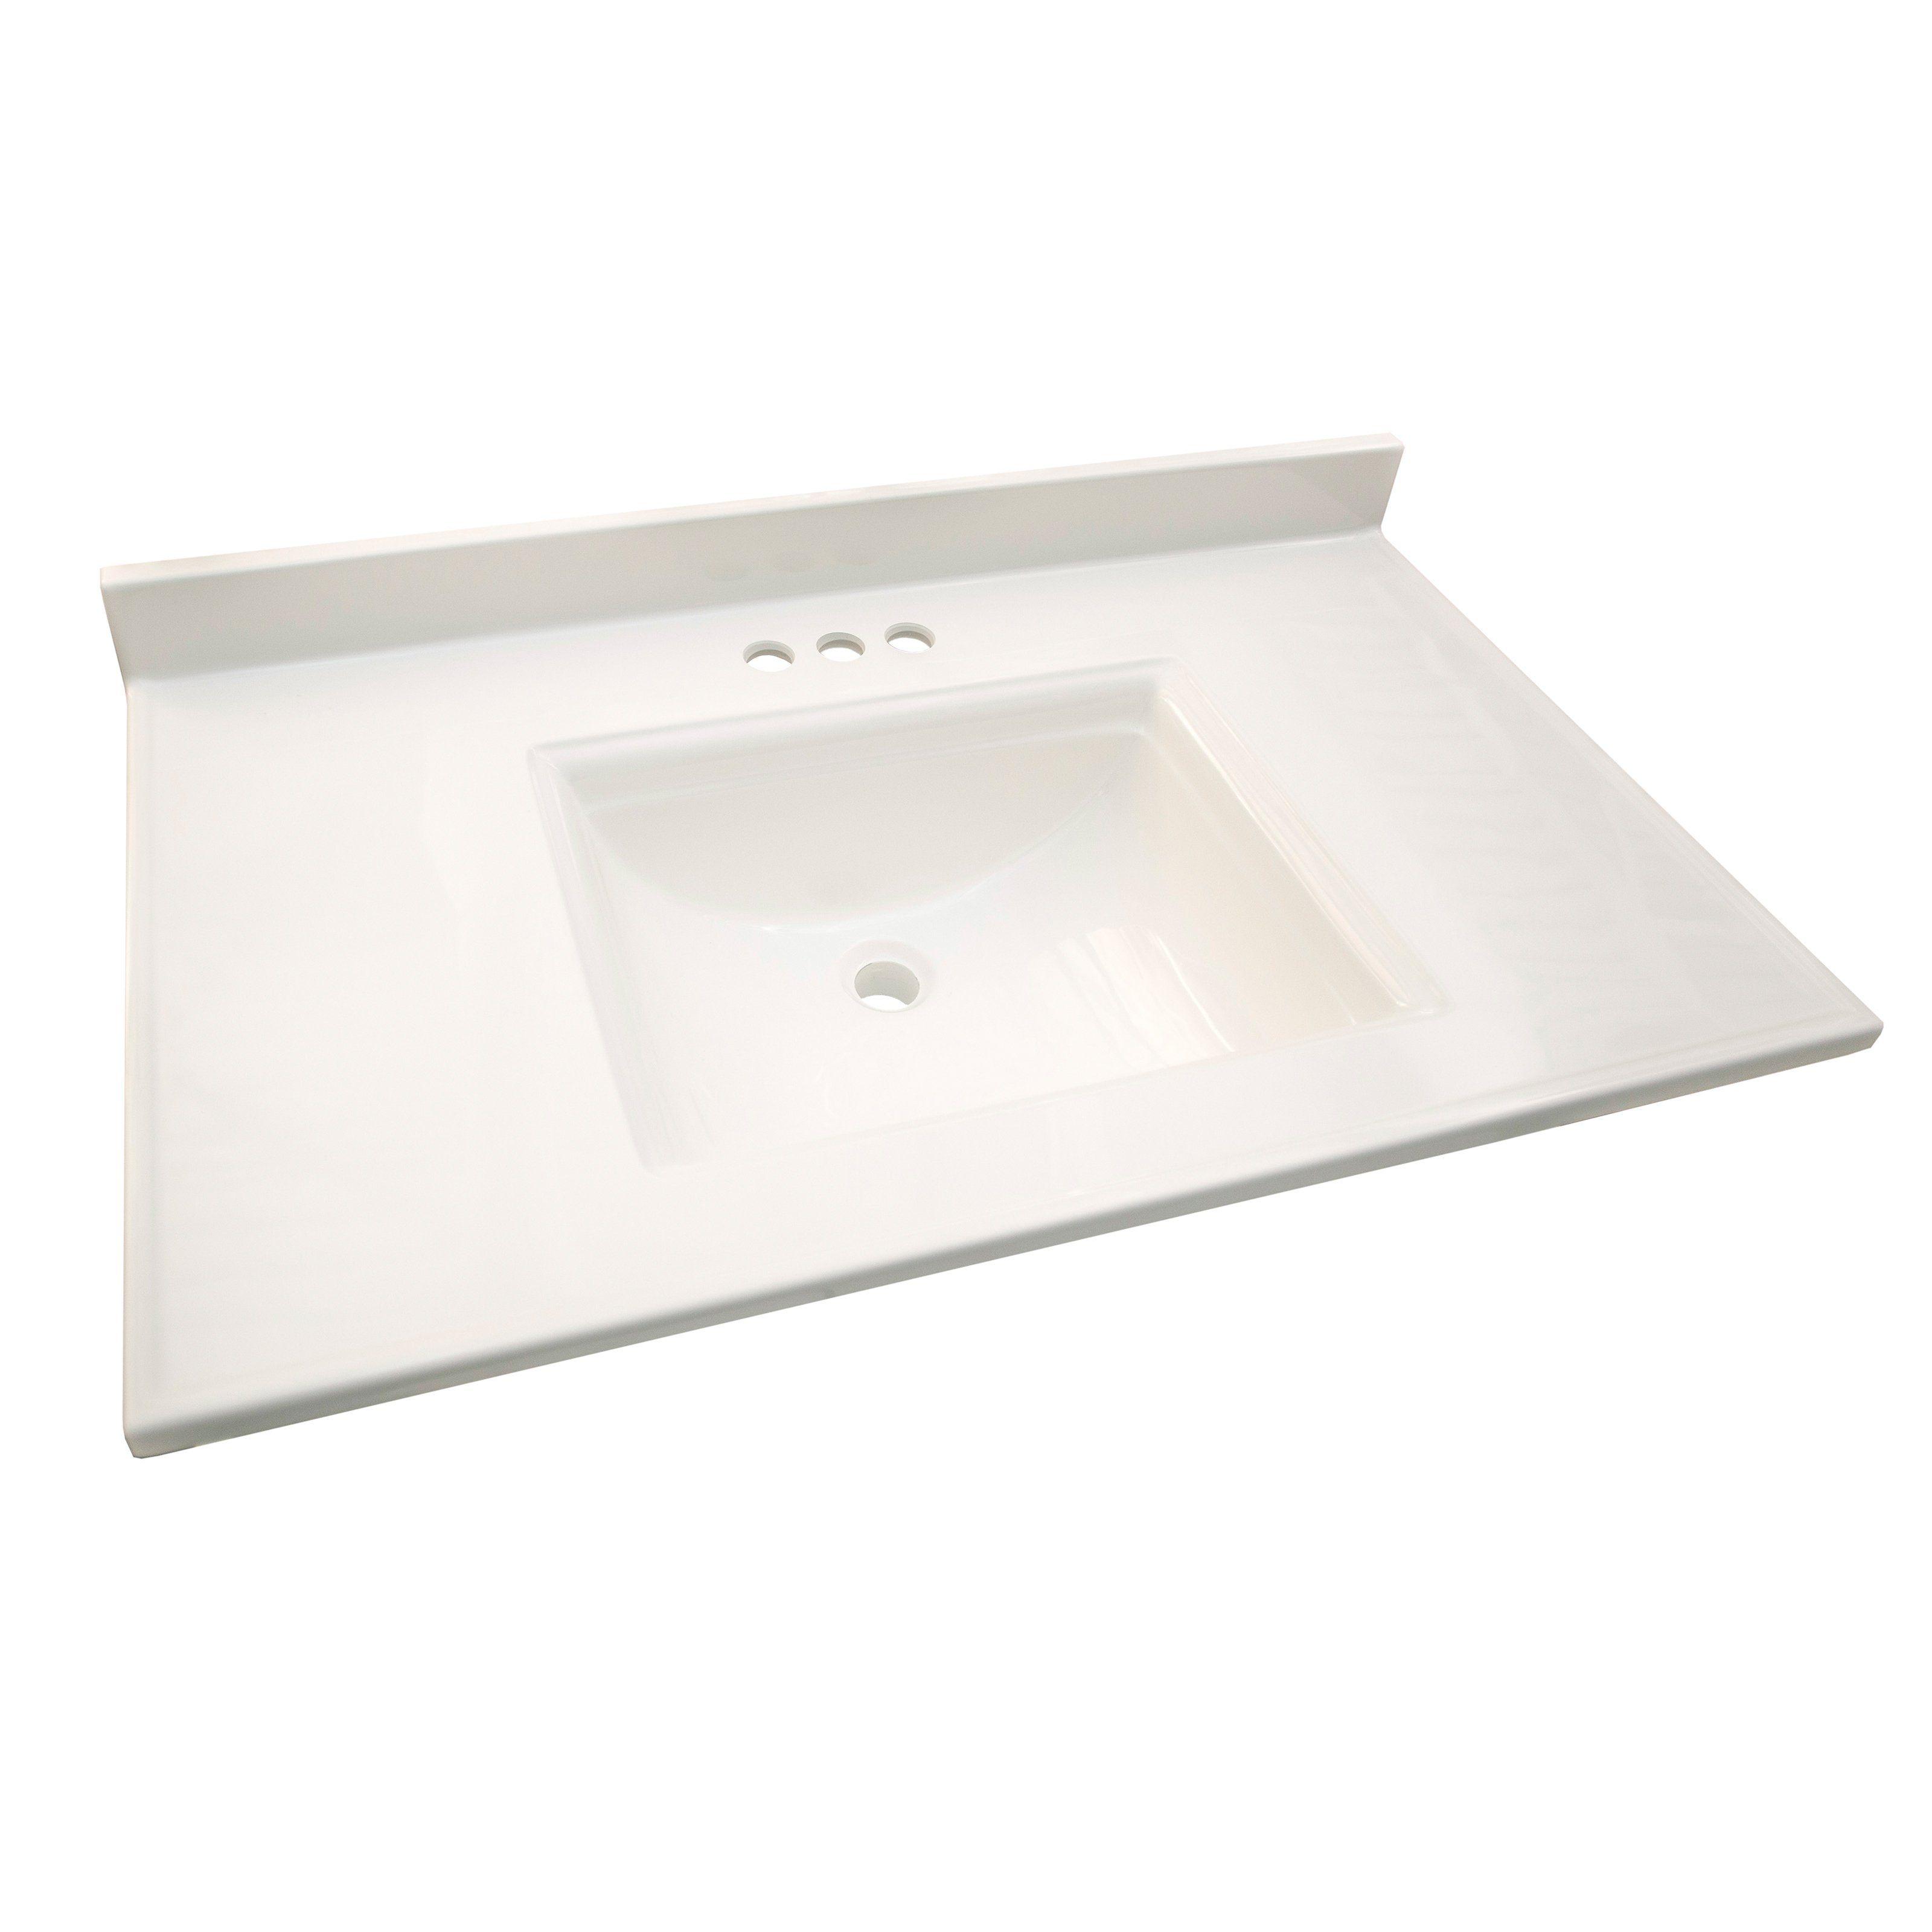 design house camilla 61 in single vanity top with backsplash from rh pinterest com